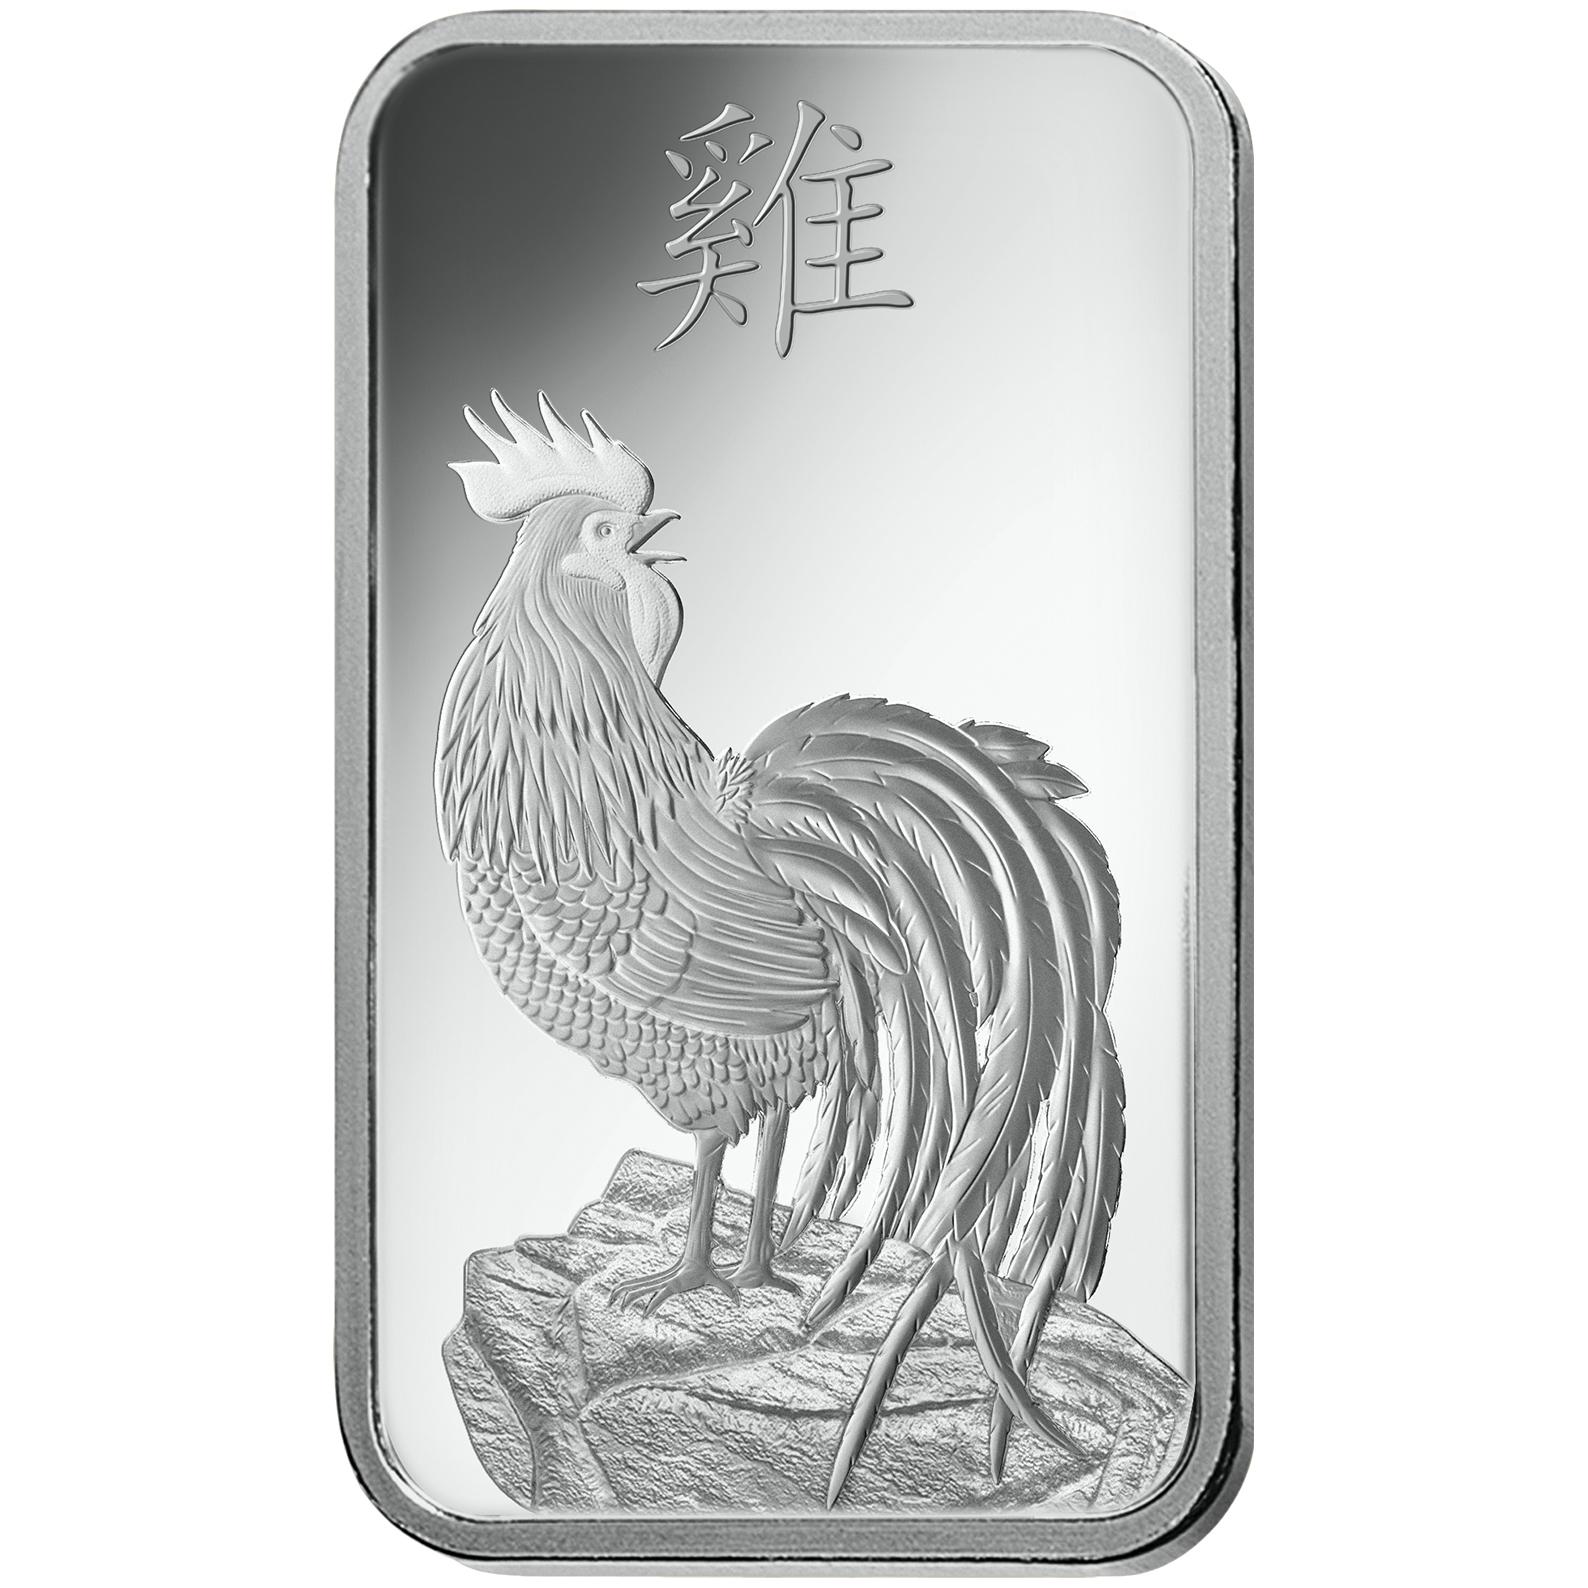 10 grammi lingottino d'argento - PAMP Suisse Lunar Gallo